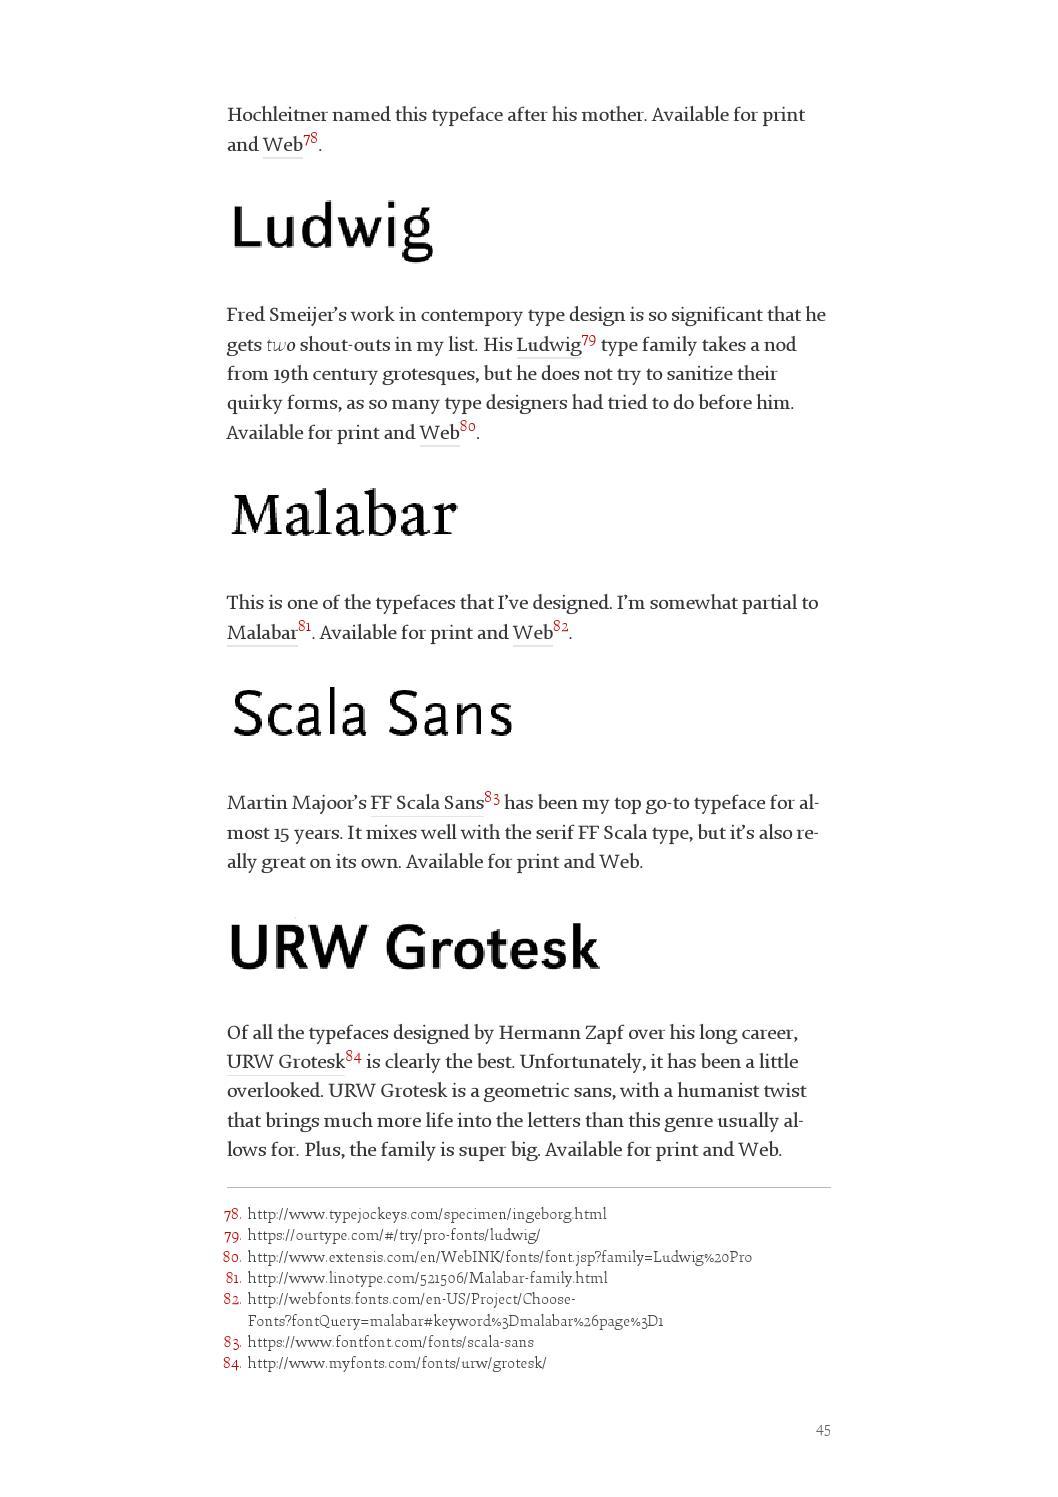 Smashing ebooks 38 typography best practices by milko02010